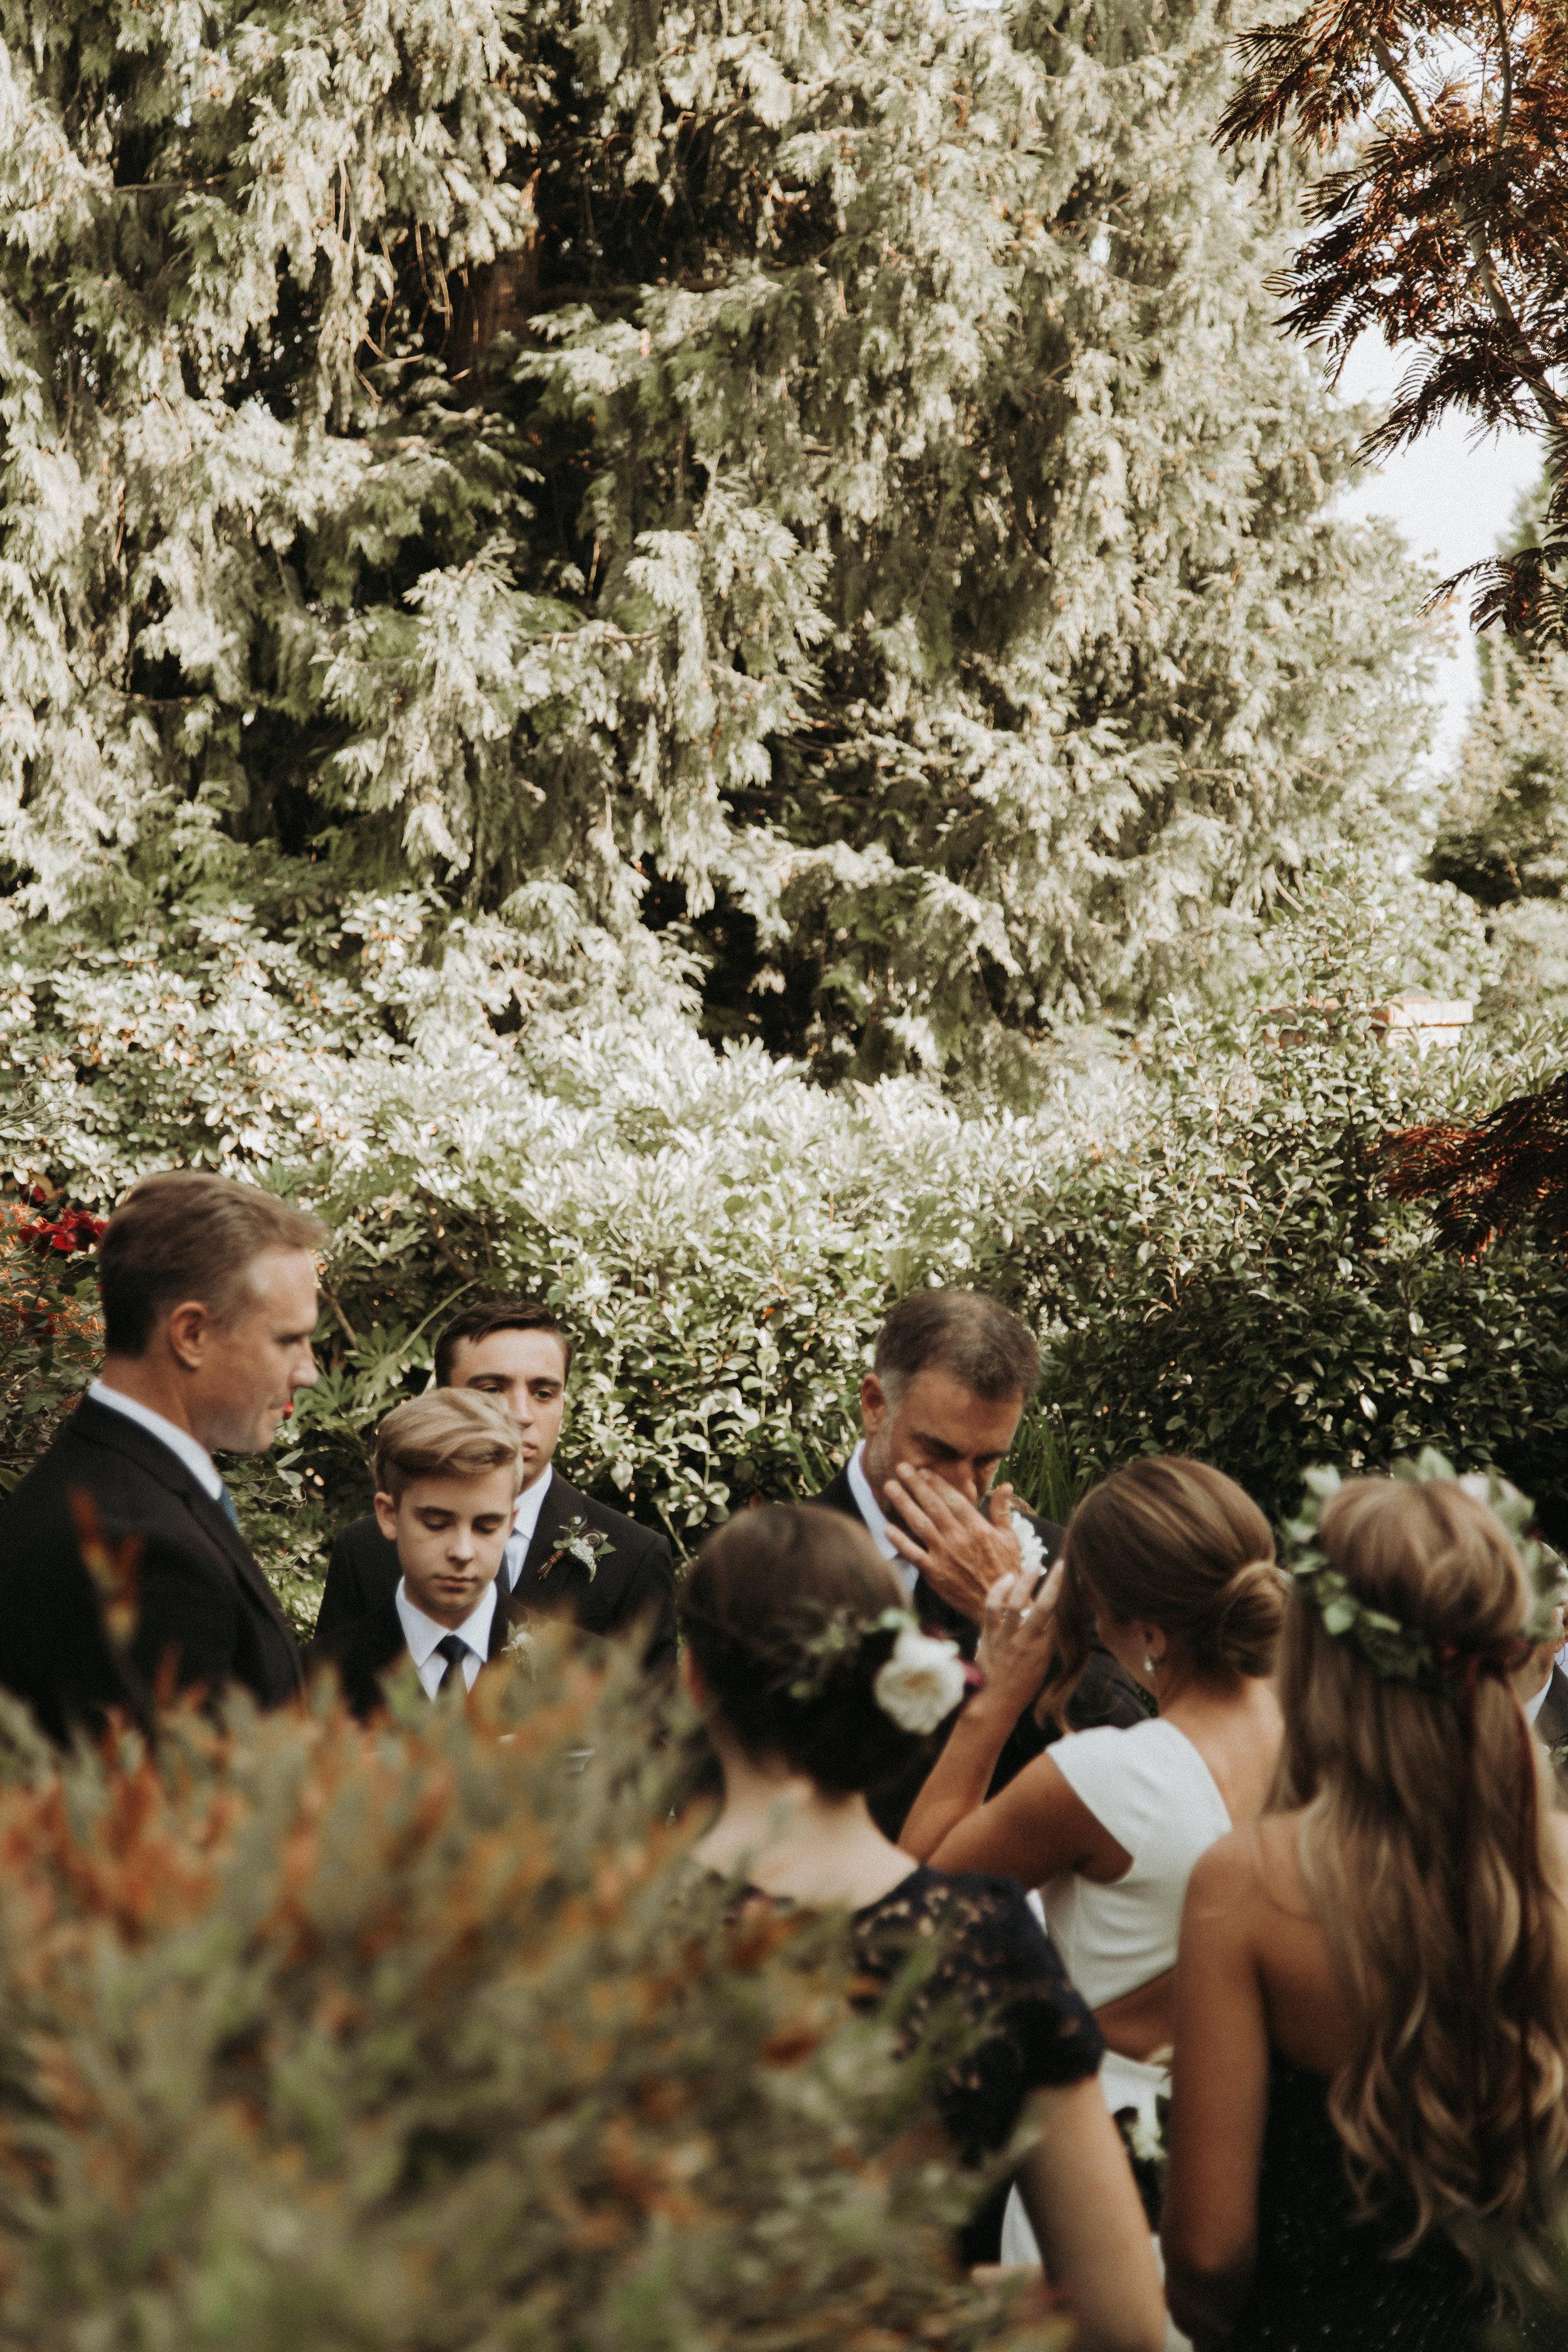 PORTLAND INTIMATE BACKYARD WEDDING_JENNY CHOKBENGBOUN PHOTO-245.JPG